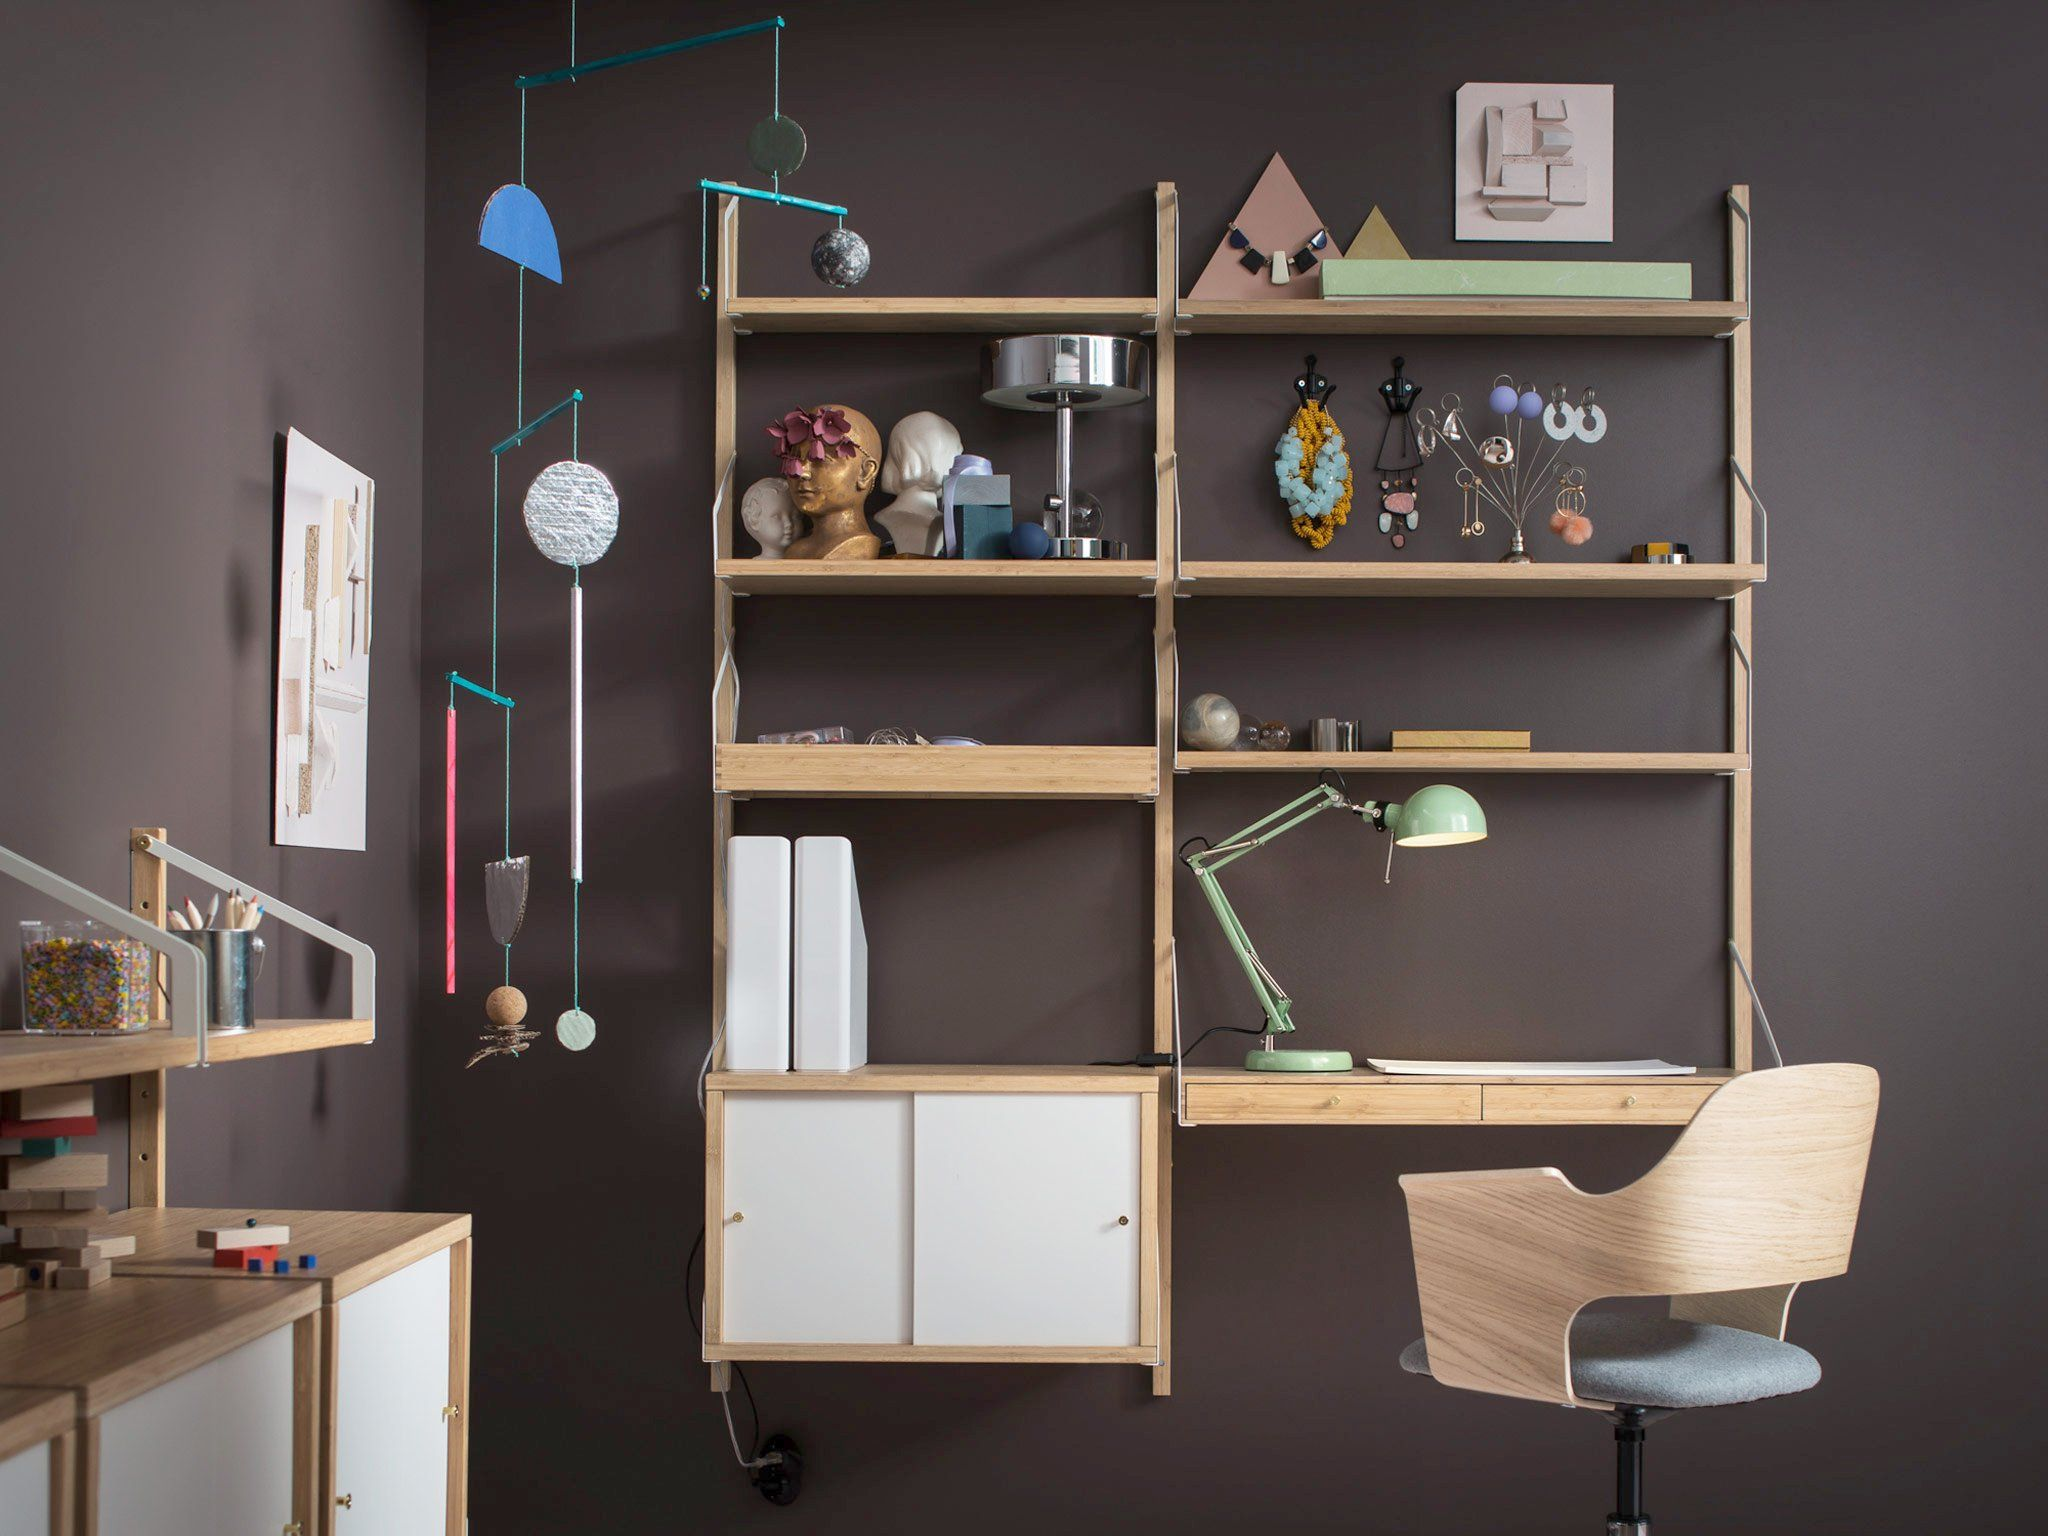 office wall mounted shelving units kids room shelvesmarvelous attractive ikea office shelves home with wall mounted shelving unit in bamboo desk combined units modular metal wire shelf utility